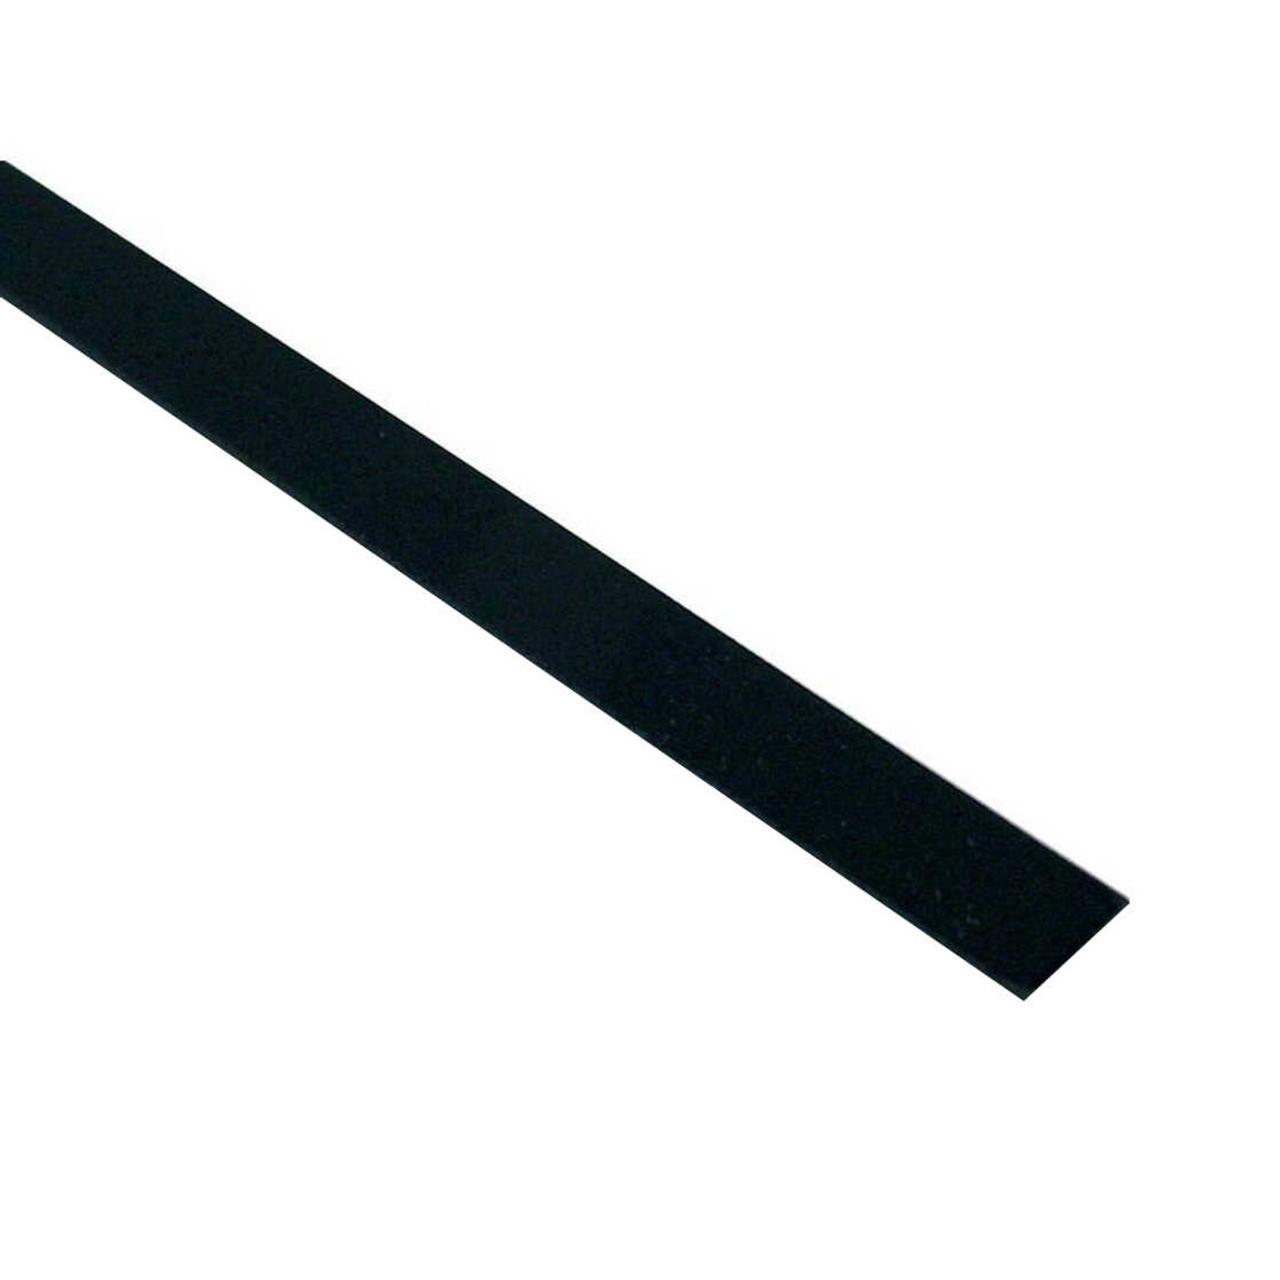 Plastic Binding - 0.5mm Black